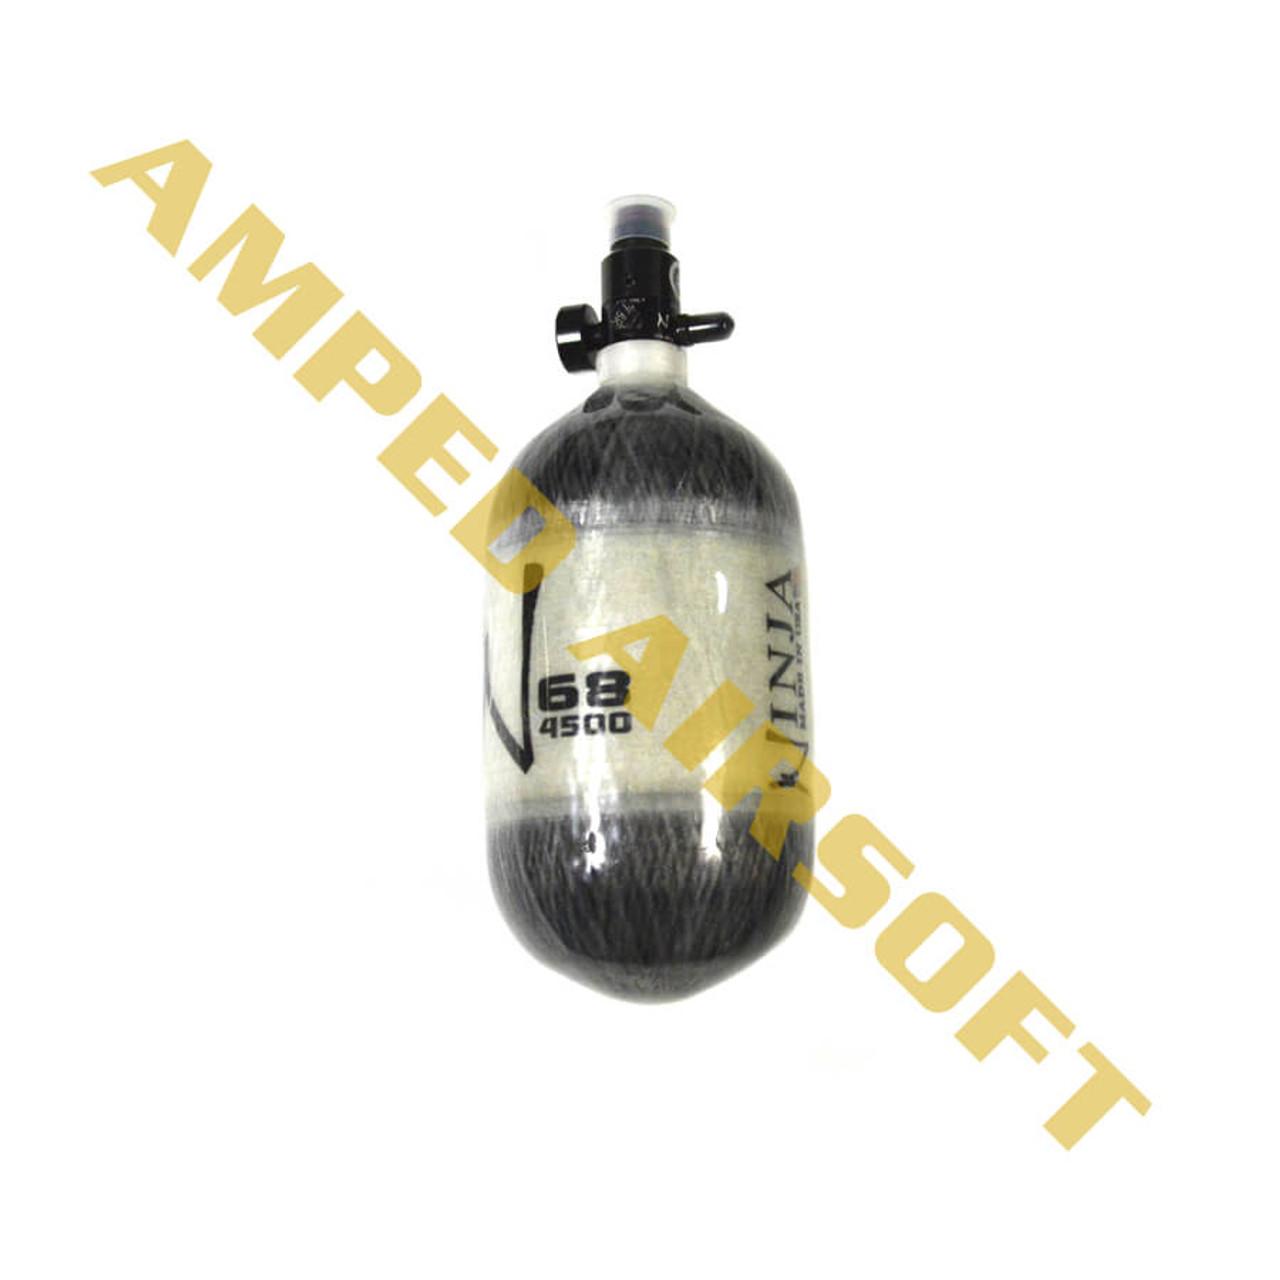 Ninja - 68/4500 Carbon Fiber Air Tank (Grey)